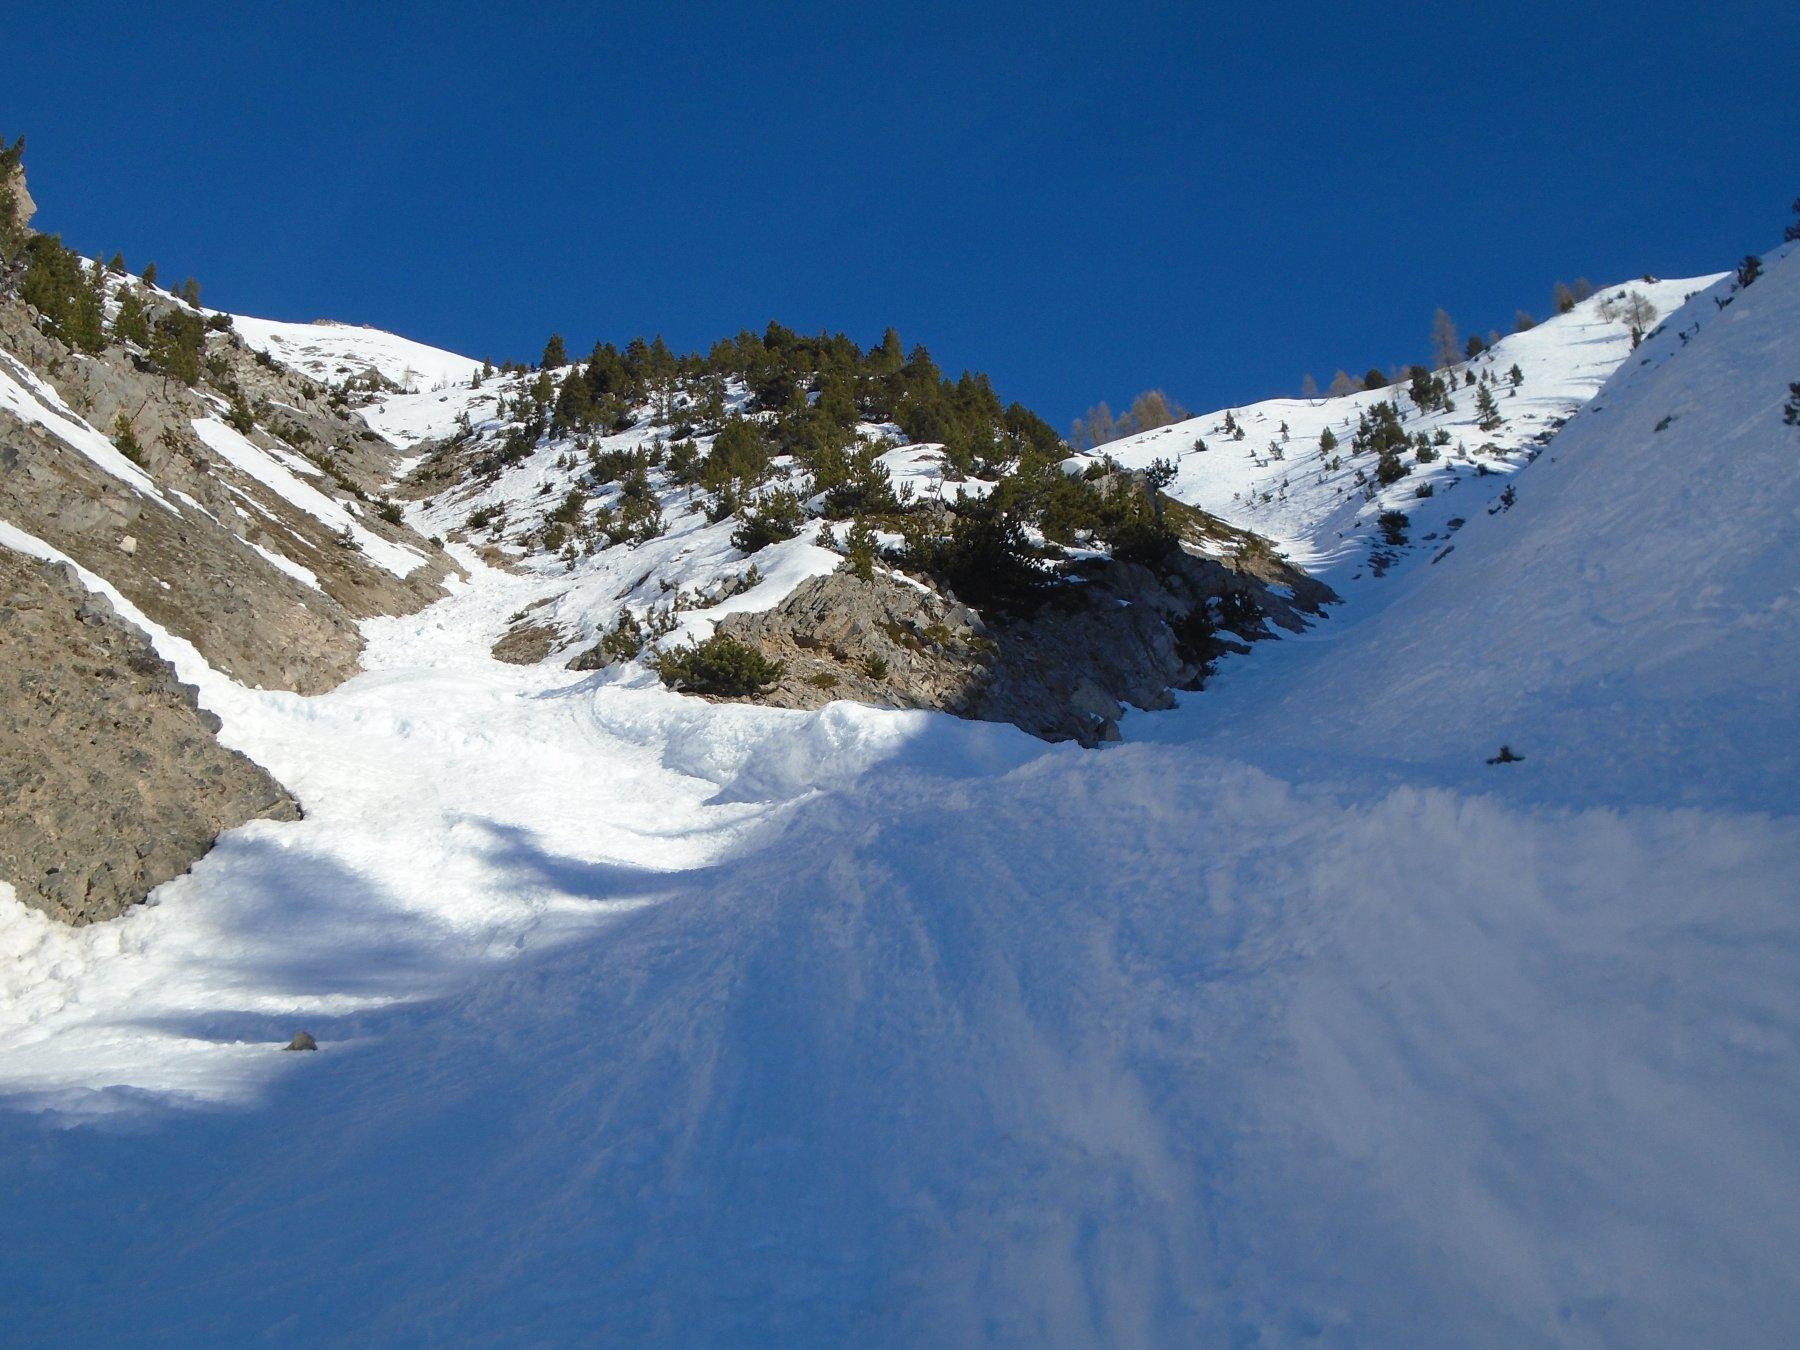 Bivio inferiore/principale: a sx manca neve